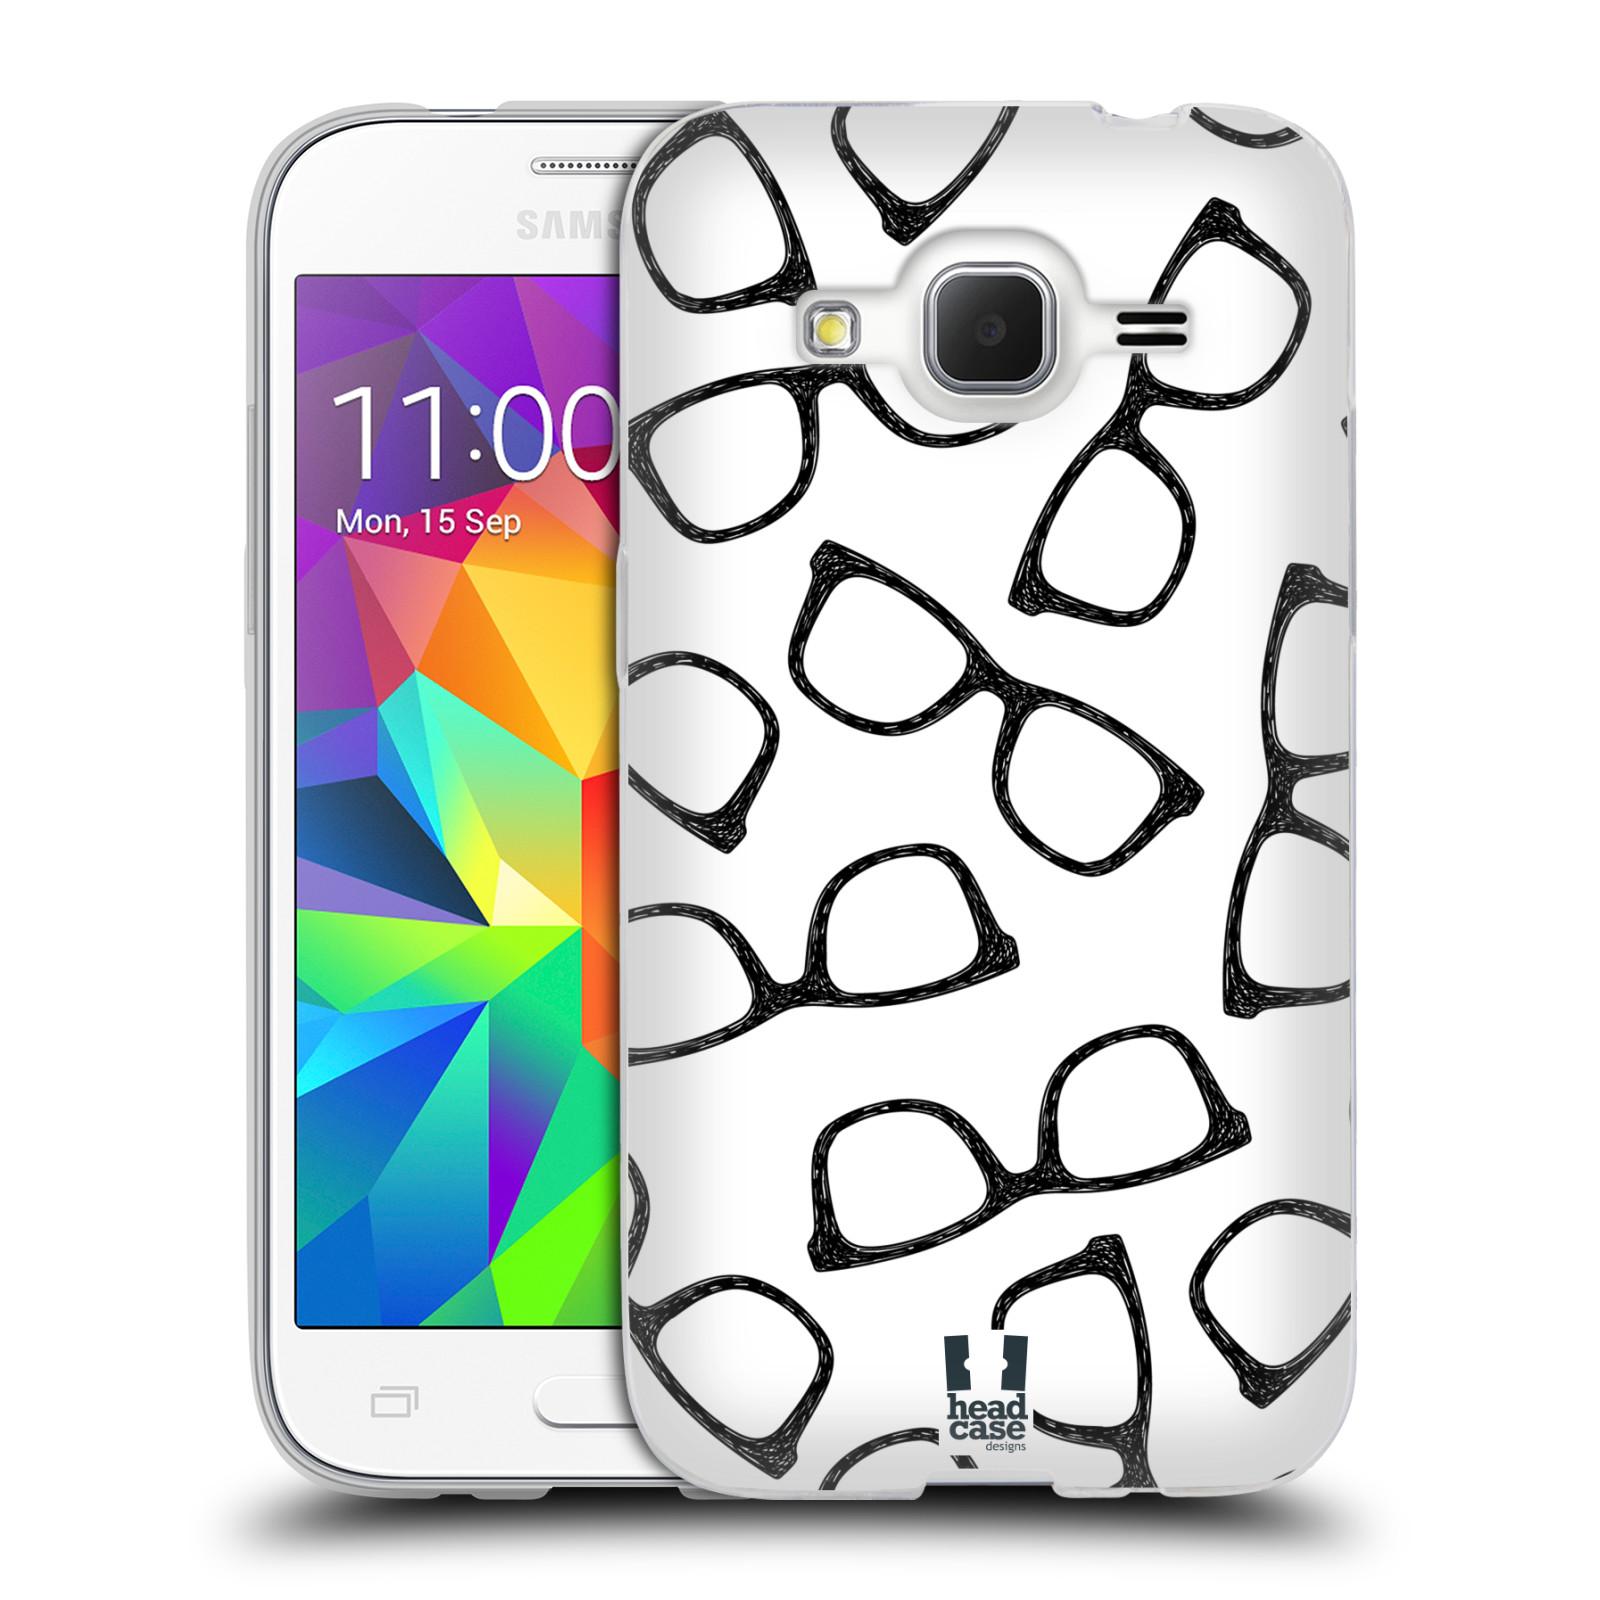 Silikonové pouzdro na mobil Samsung Galaxy Core Prime LTE HEAD CASE HIPSTER BRÝLE (Silikonový kryt či obal na mobilní telefon Samsung Galaxy Core Prime LTE SM-G360)